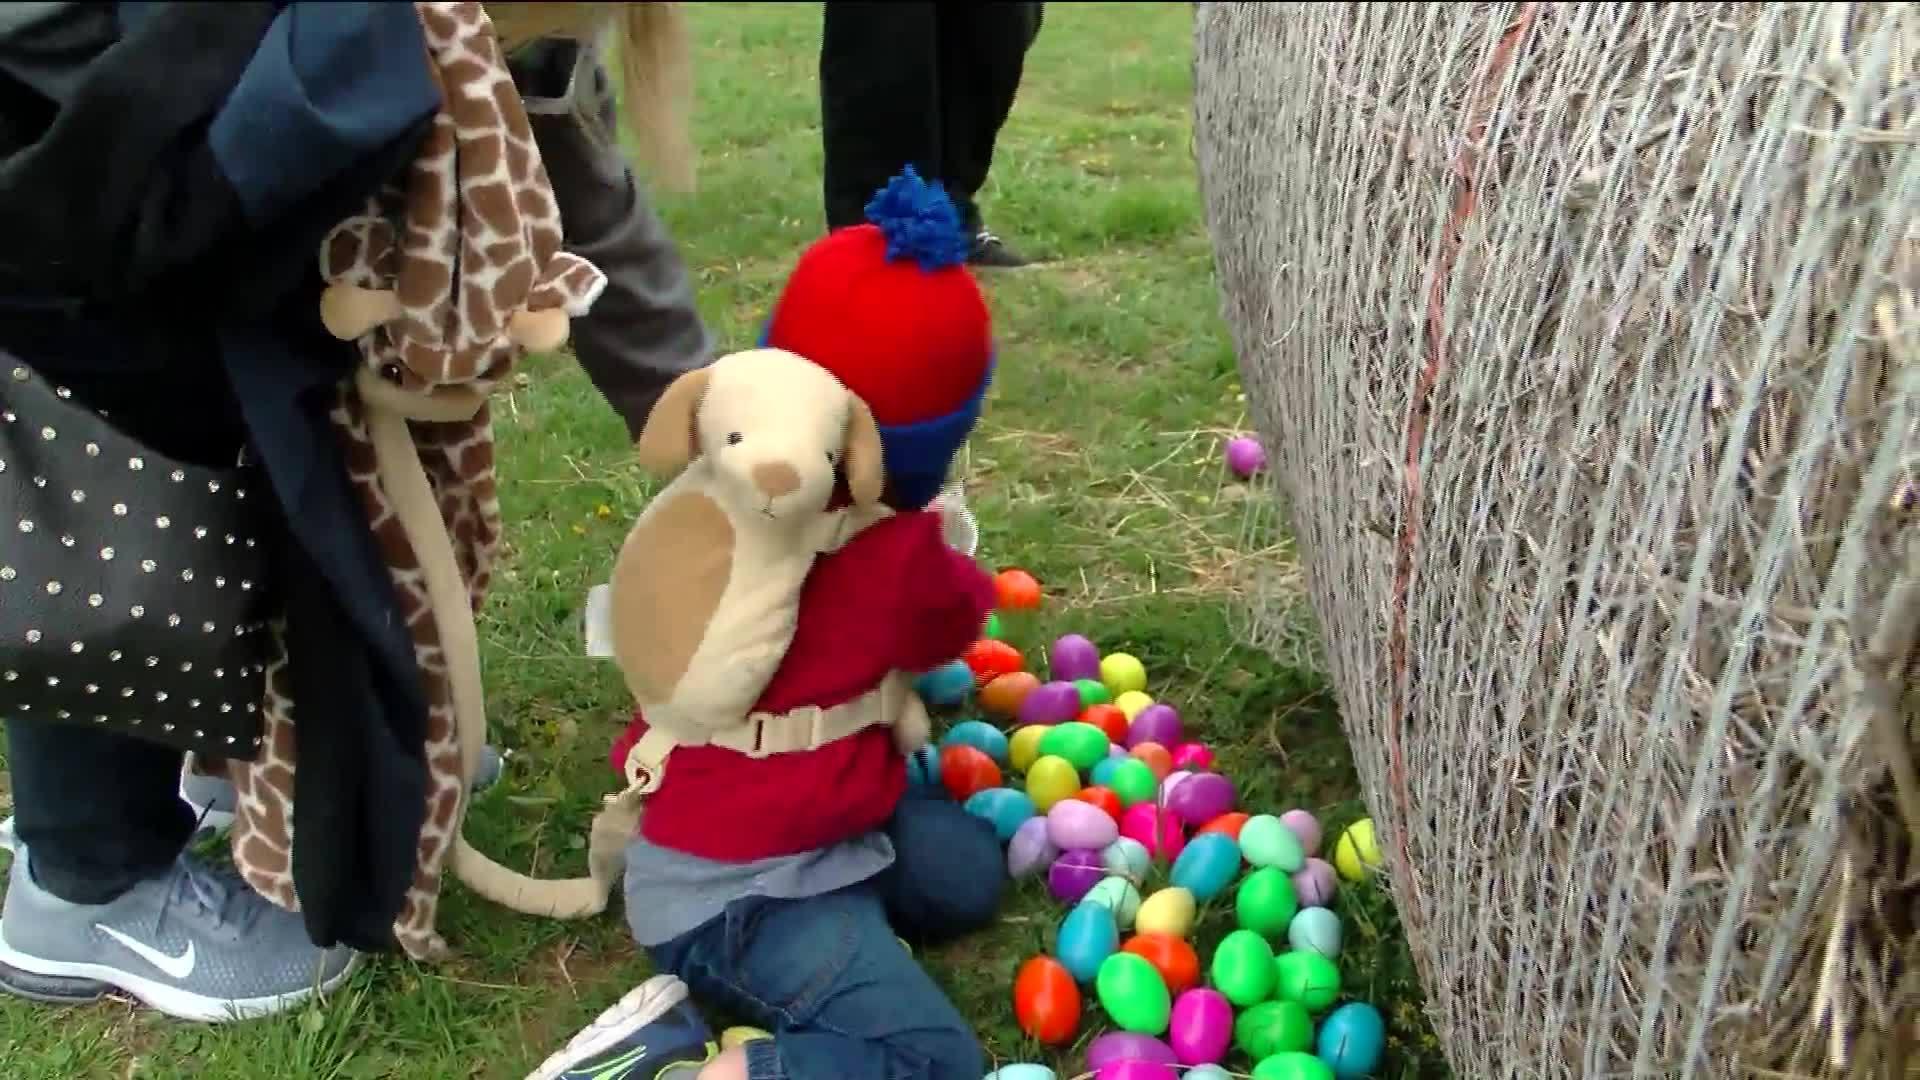 Easter_egg_hunt_featuring_twenty_thousan_6_20190414031639